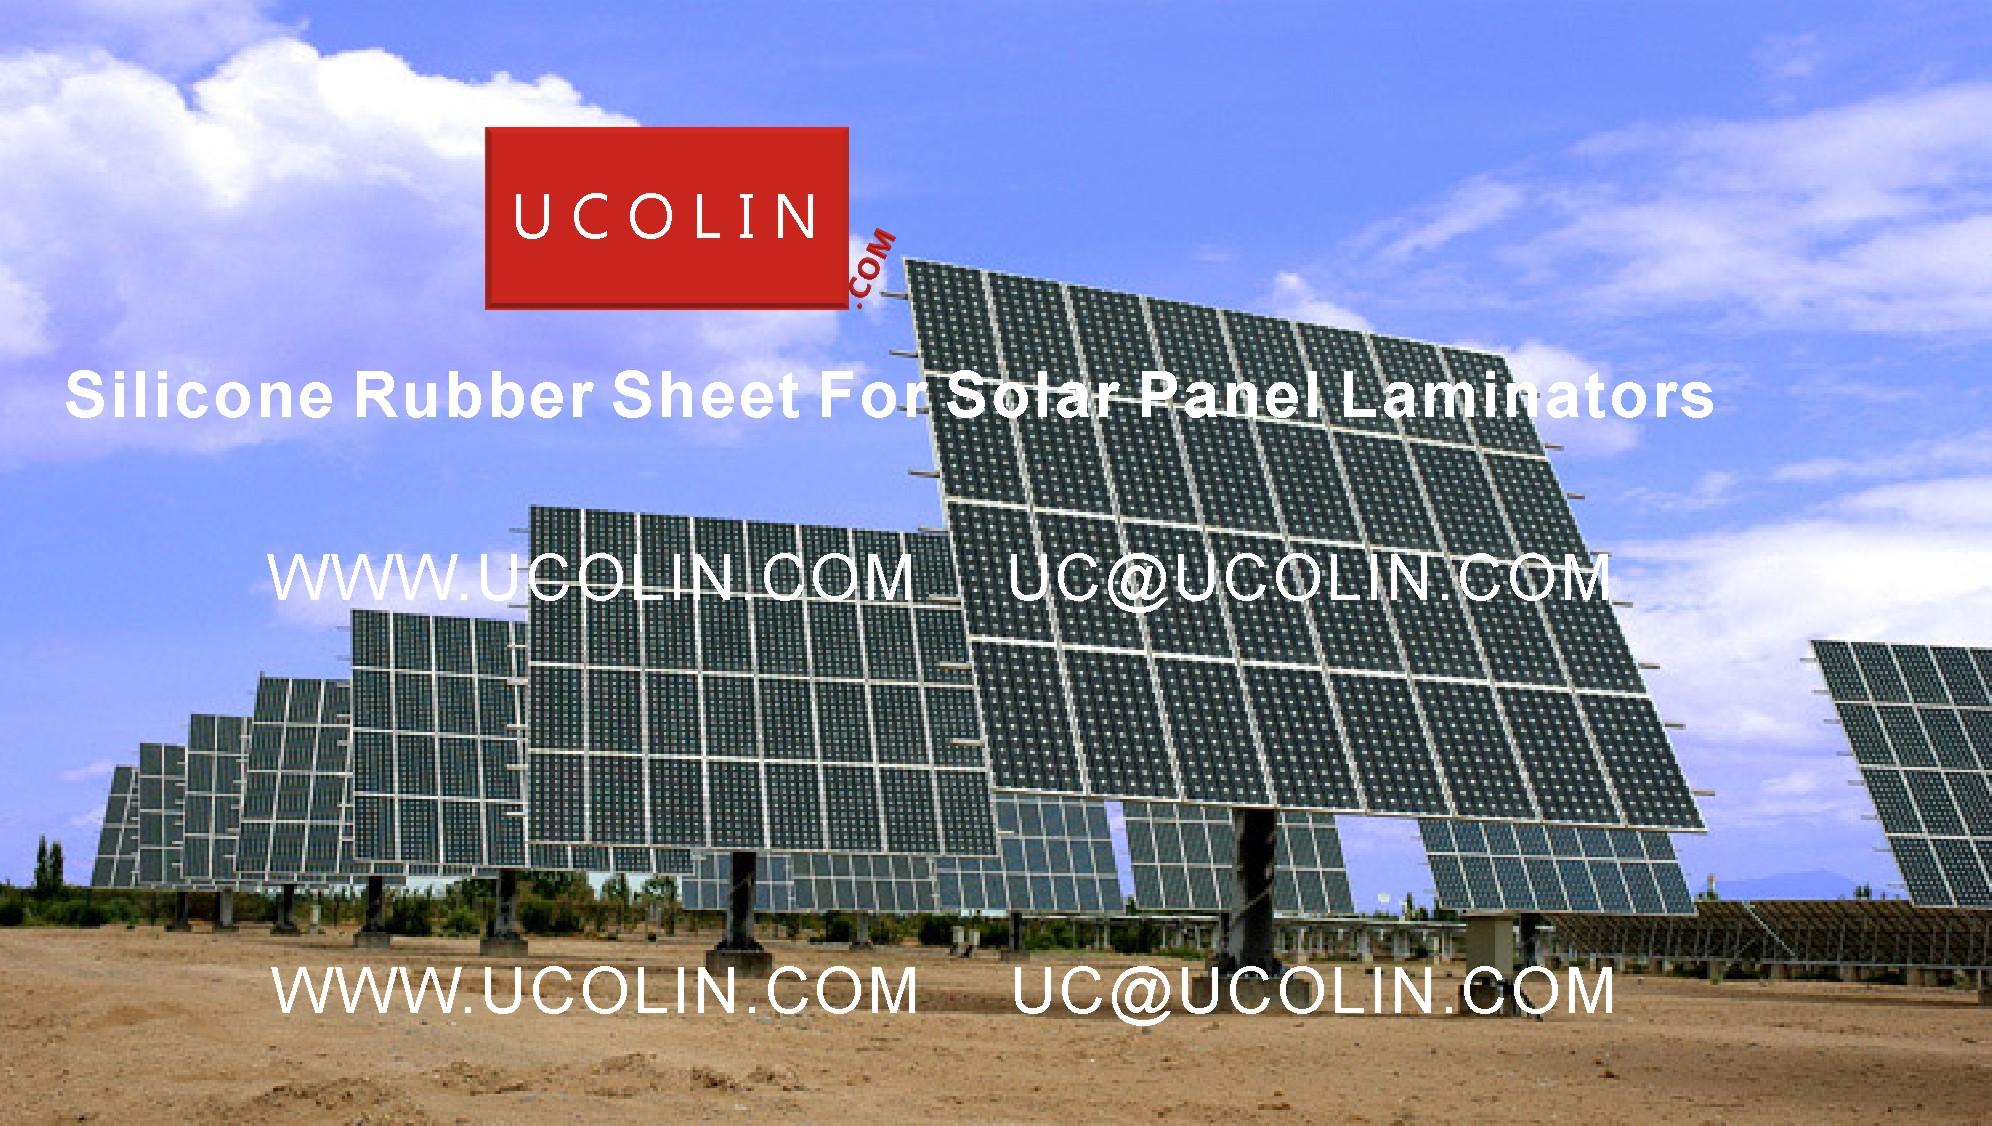 003 Silicon Rubber Sheet For Solar Panel Laminators